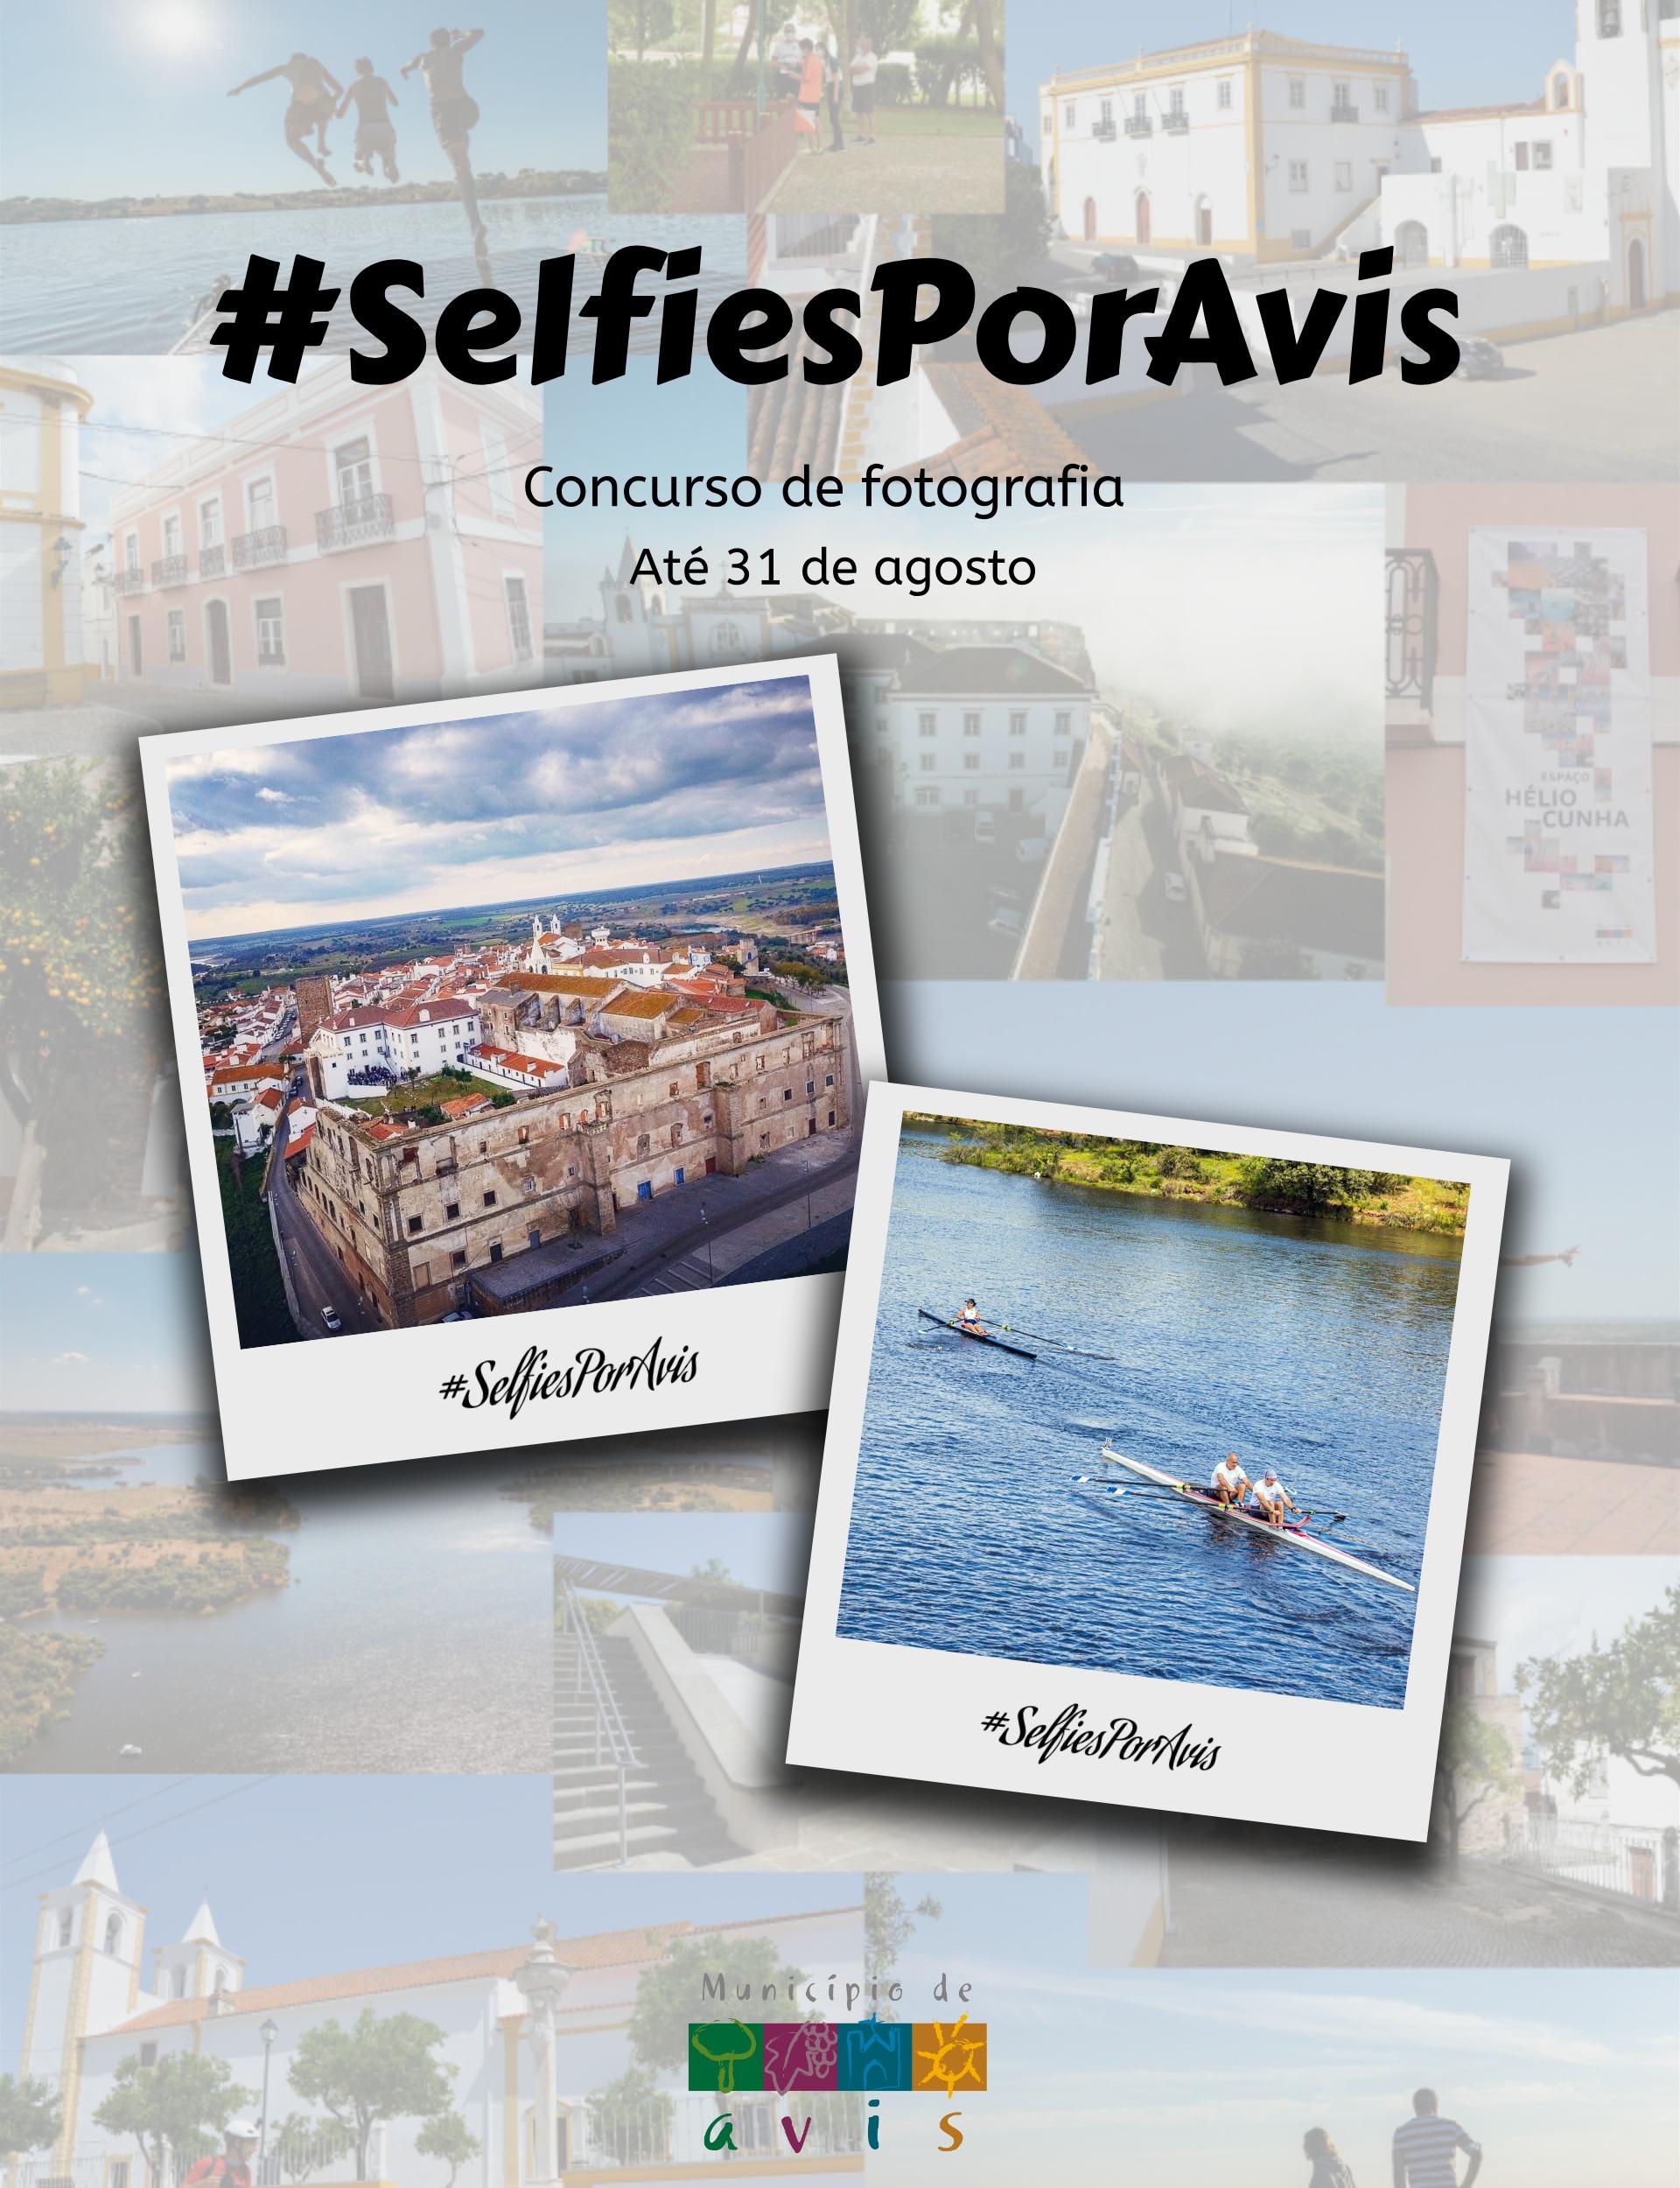 Concurso de fotografia #selfiesporavis